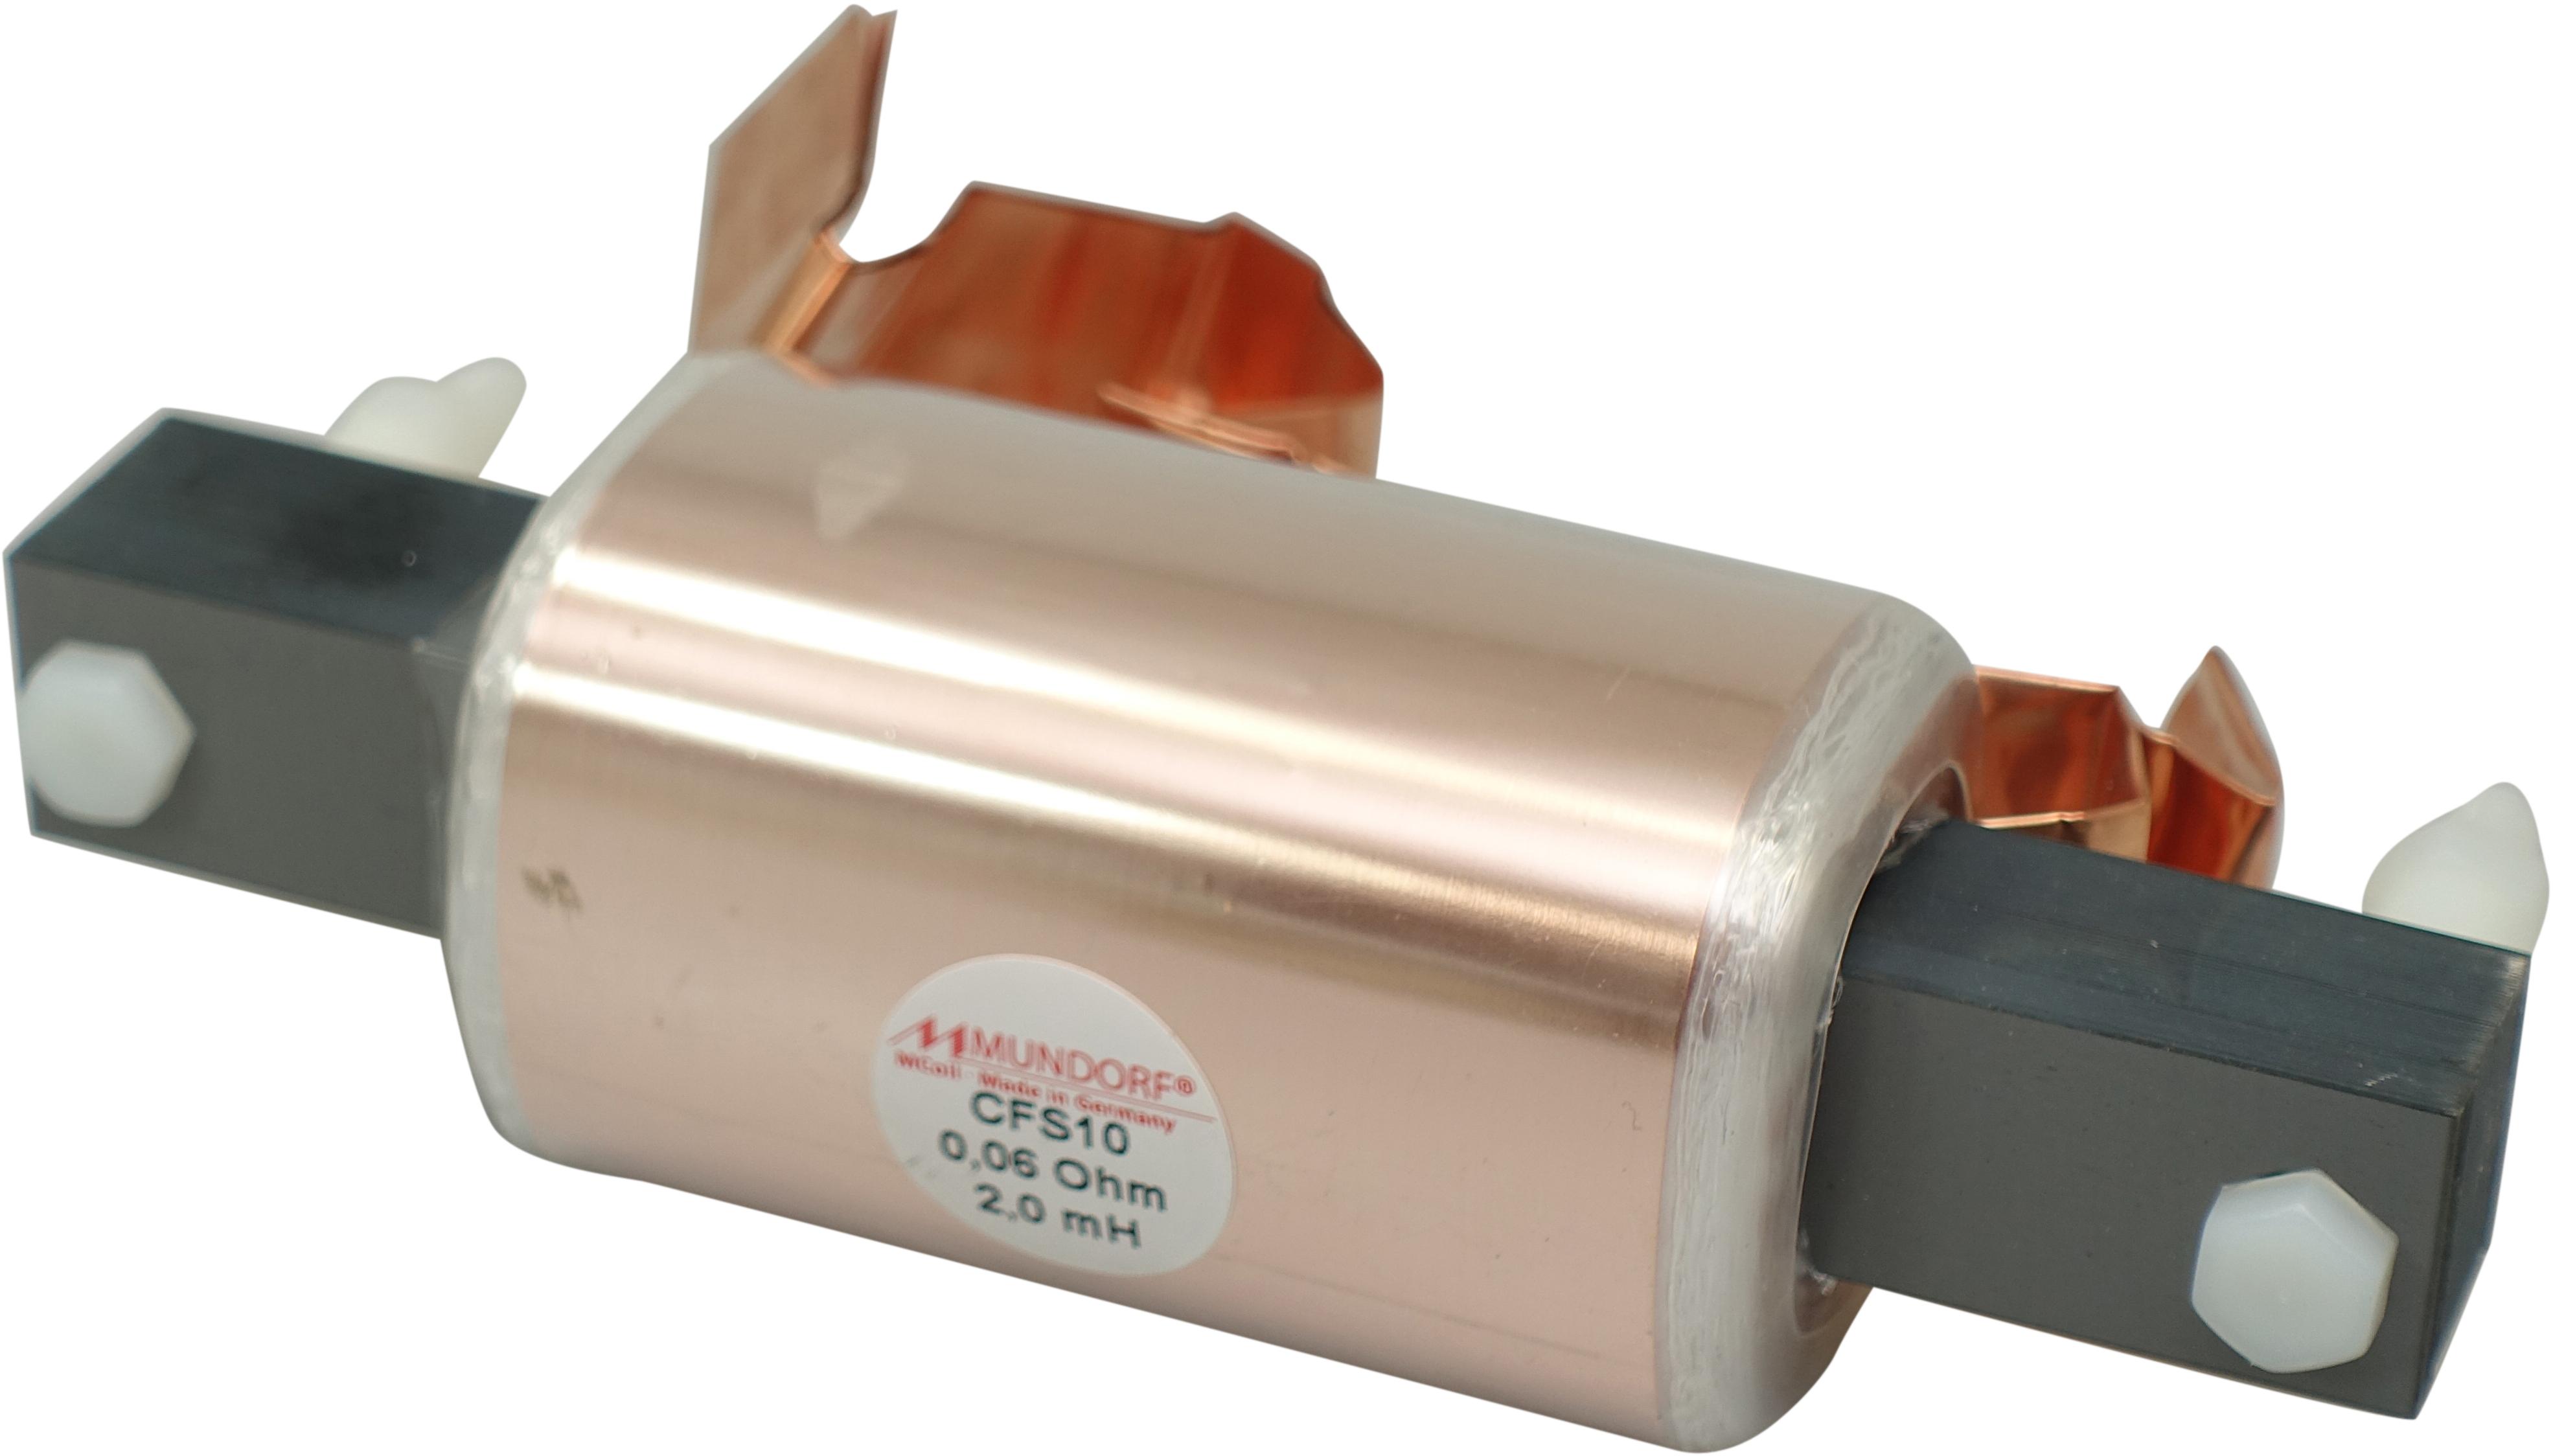 Mundorf MCoil CFS10-33mH